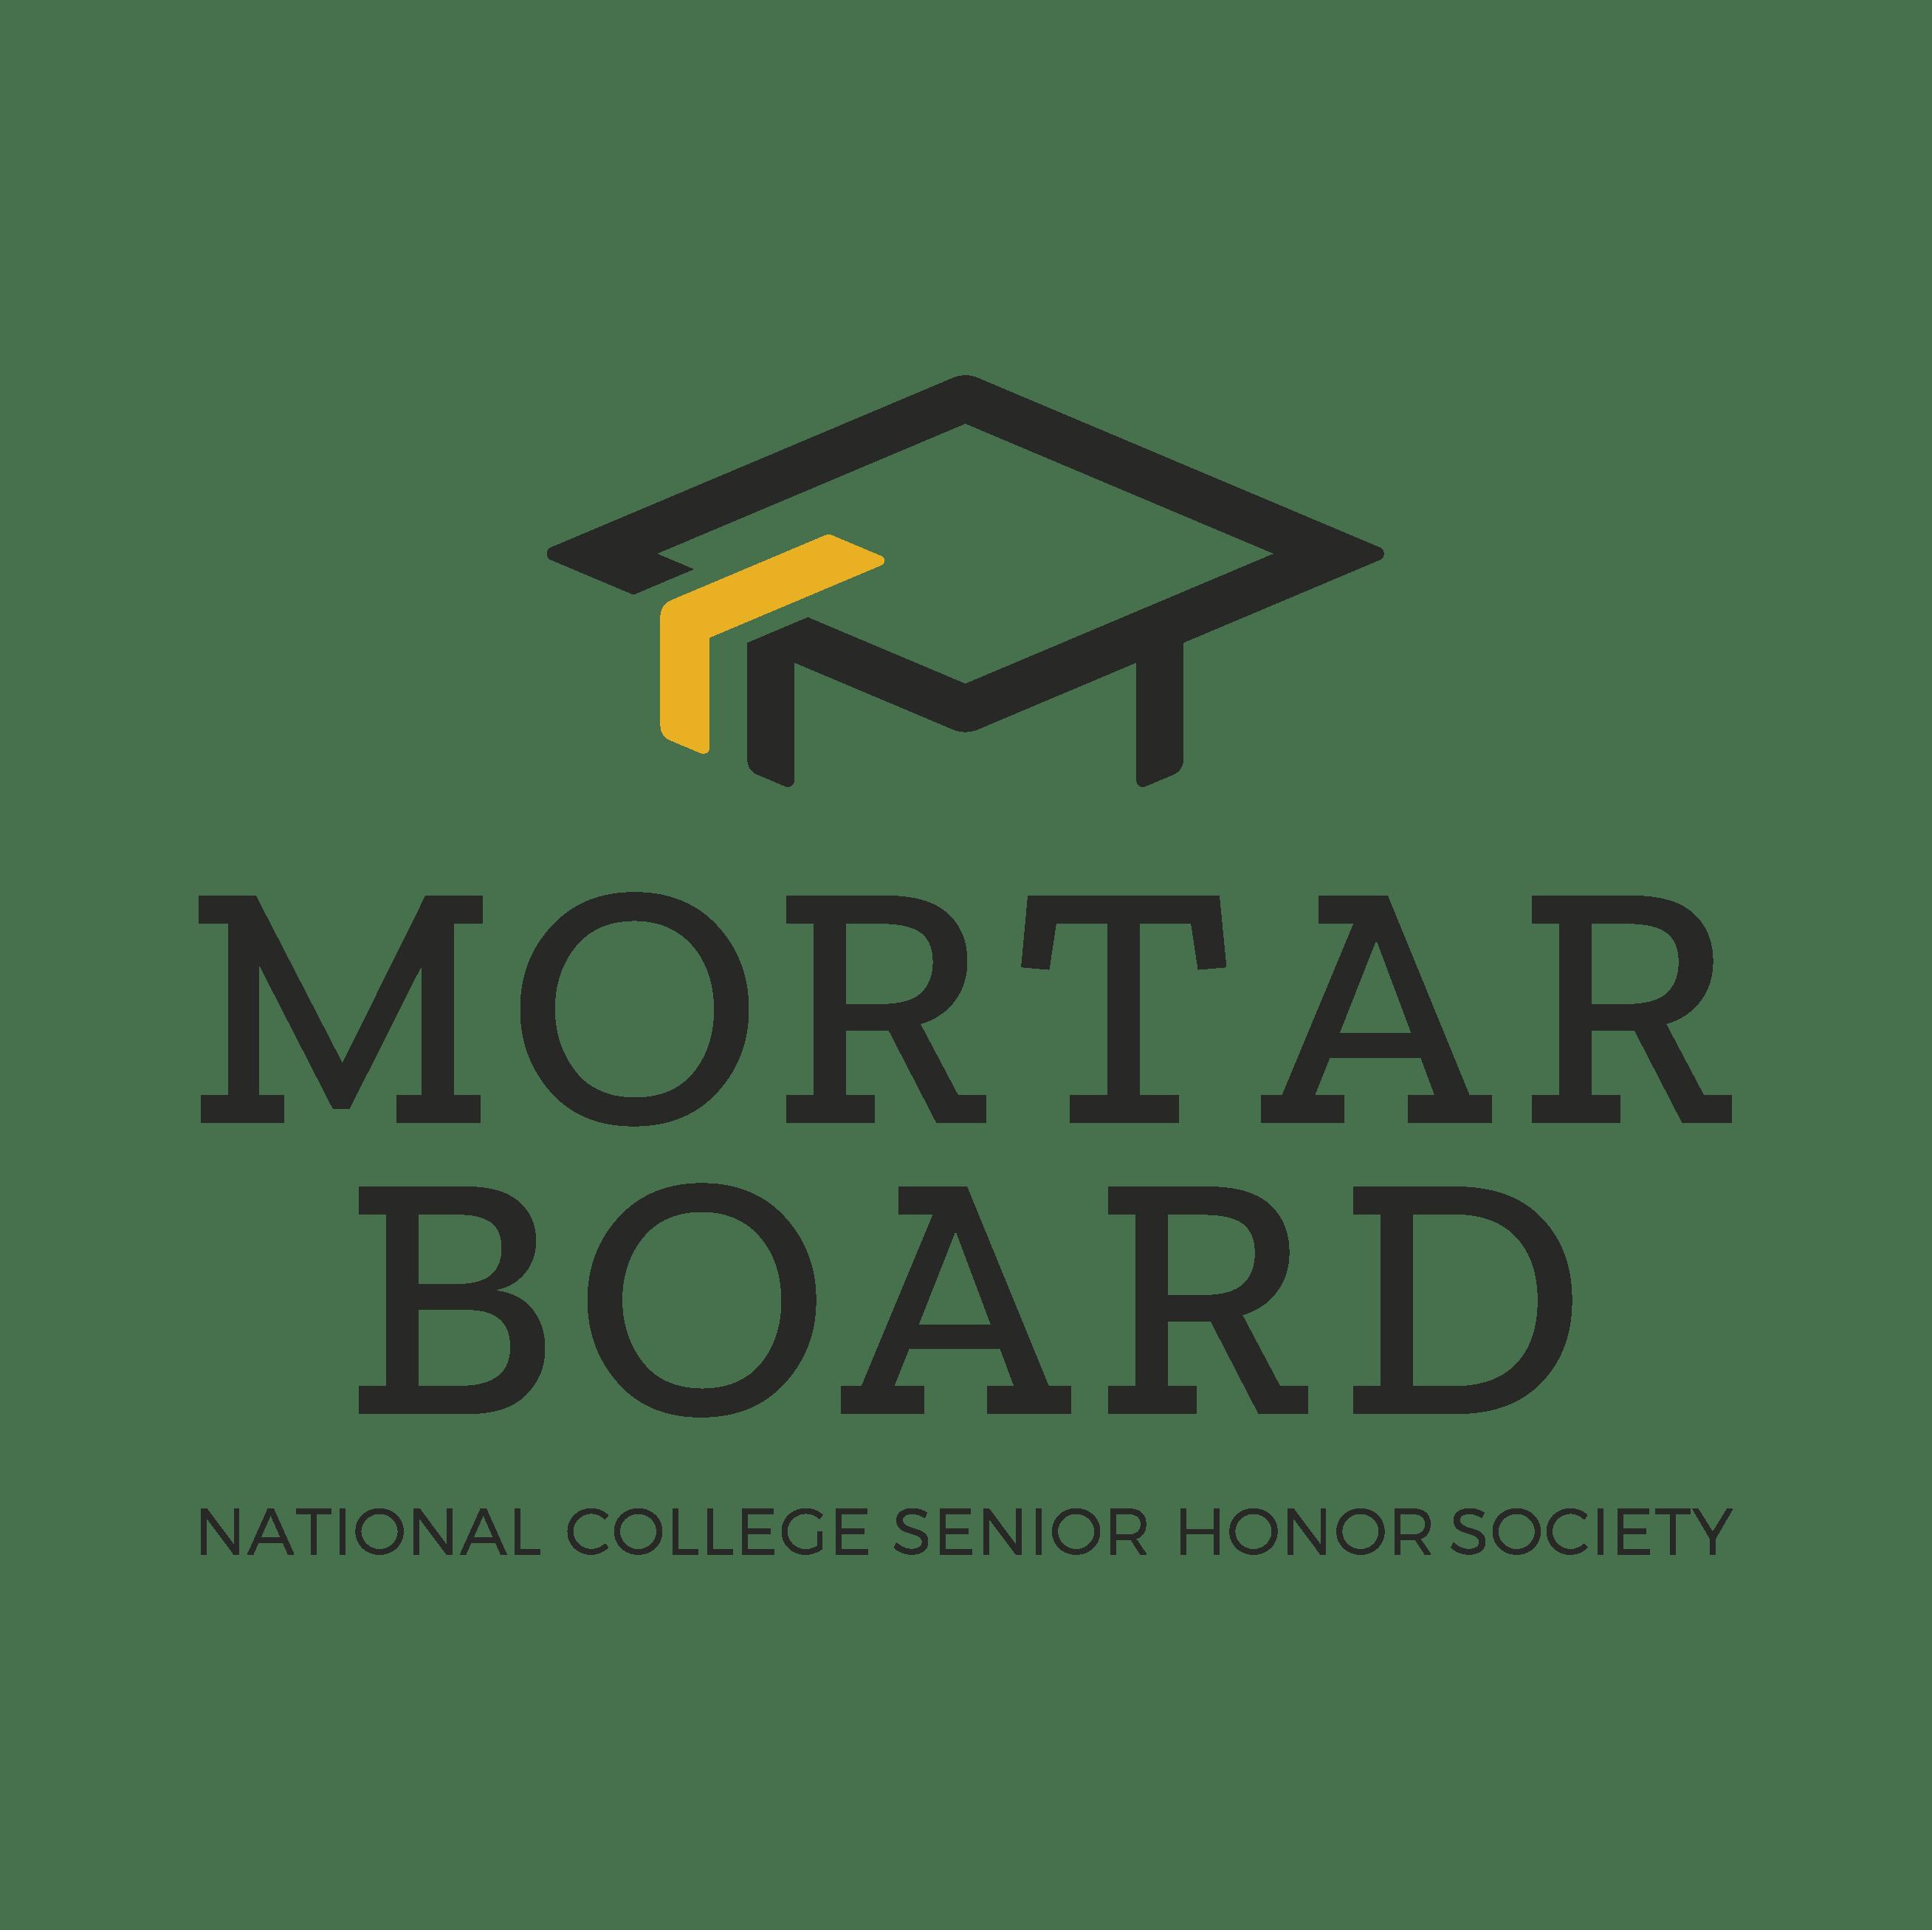 Mortar Board Honor Society